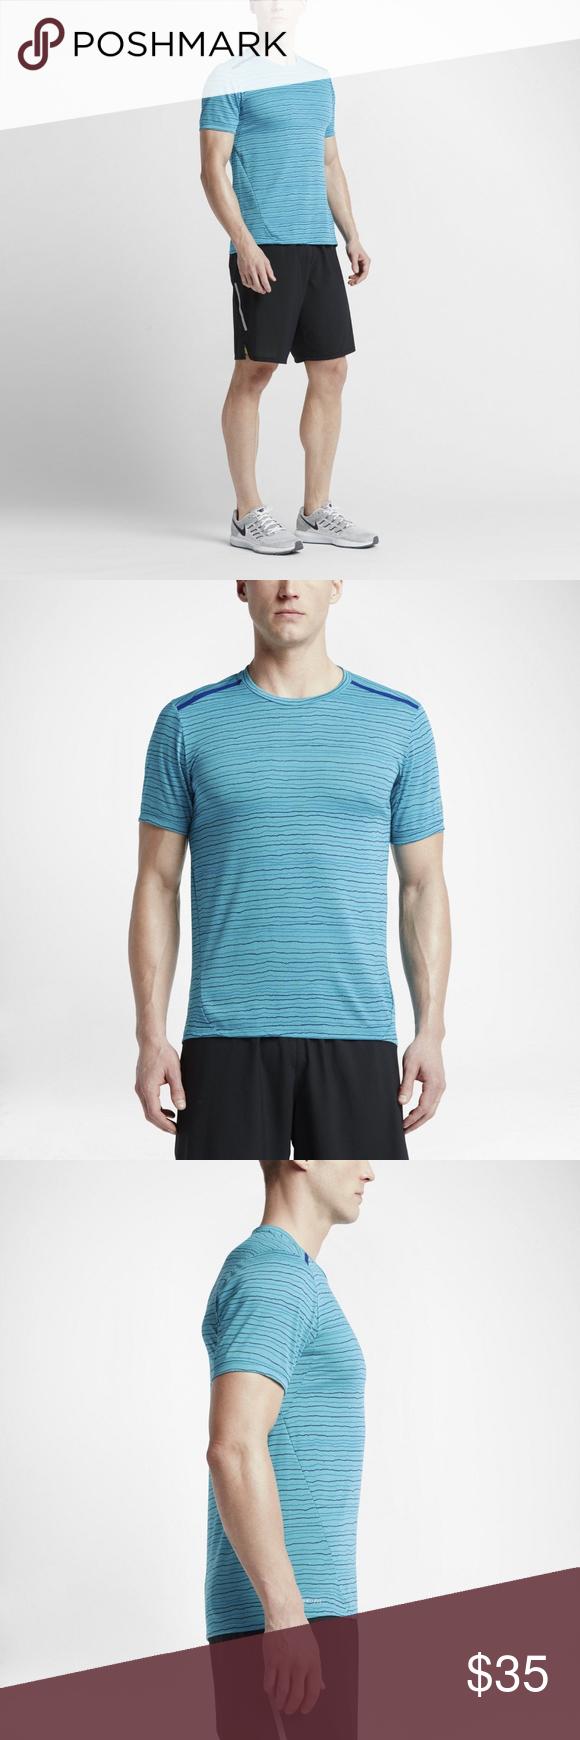 NIKE Dri FIT Cool Tailwind Men's Running Gym Shirt | Running